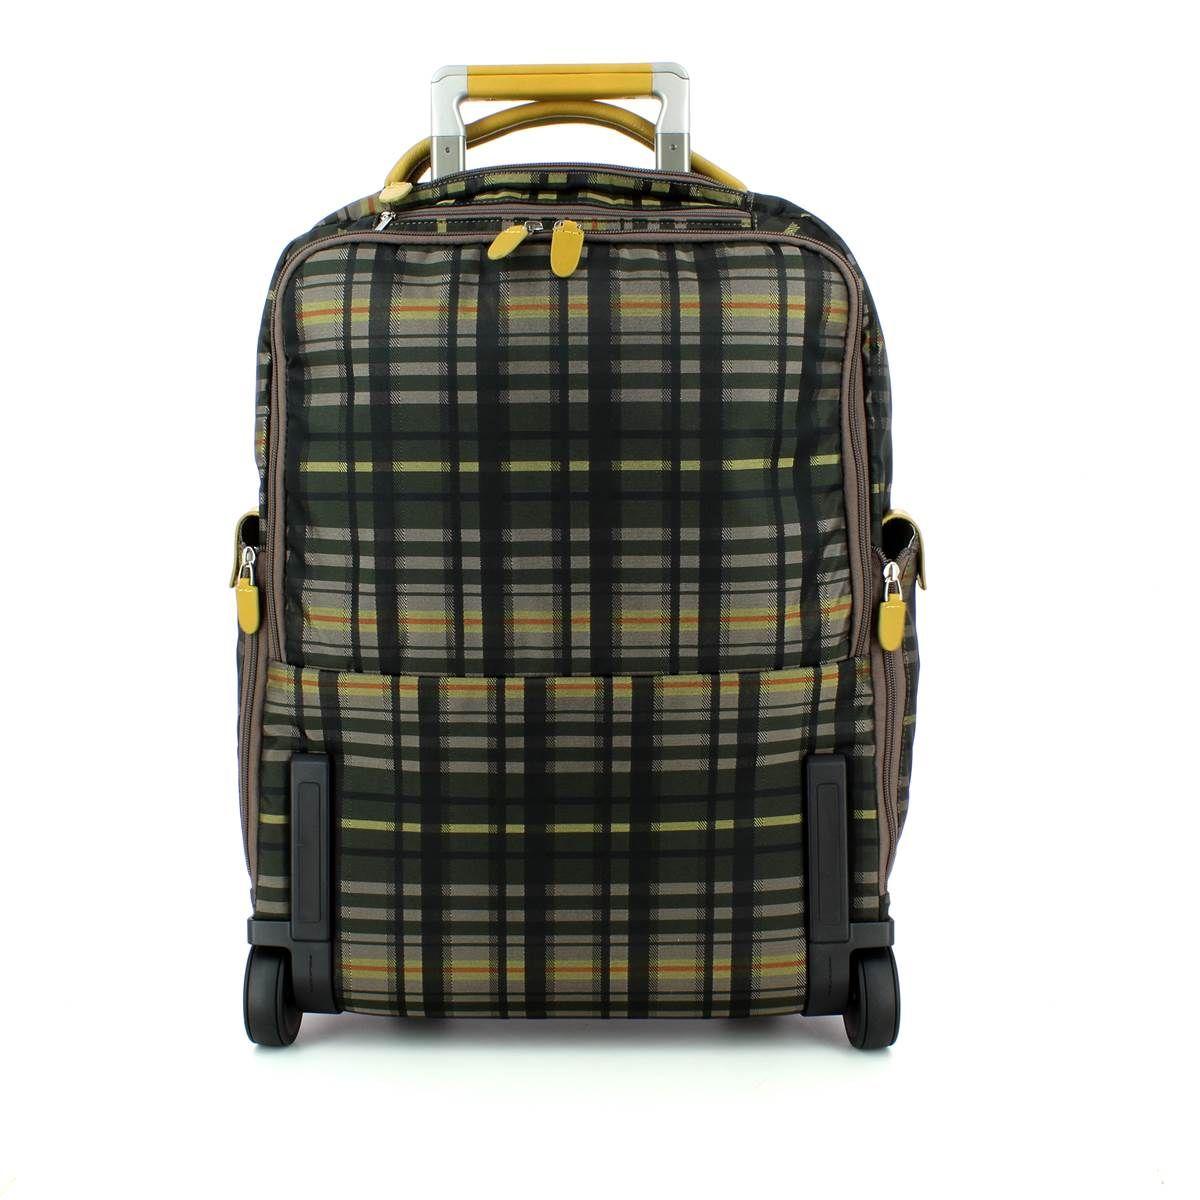 Piquadro, Cabin Luggage Trolley OS18 CHECK